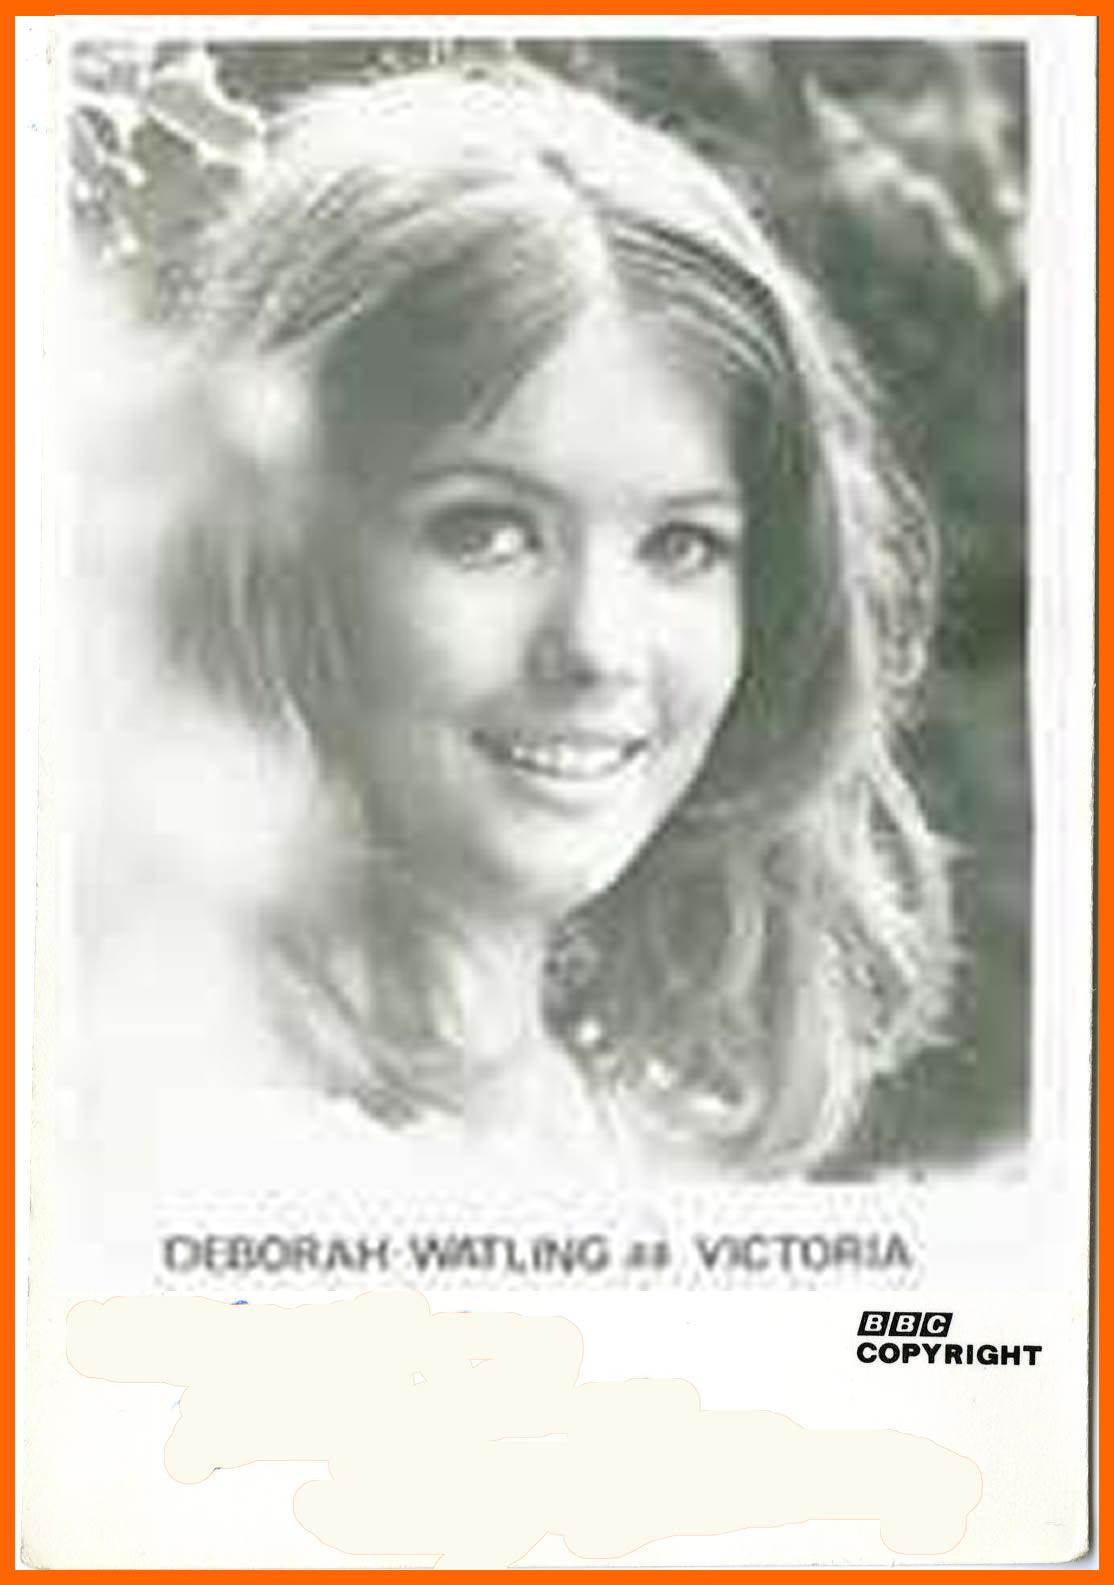 WANTED - BBC cast card of Deborah Watling as Victoria